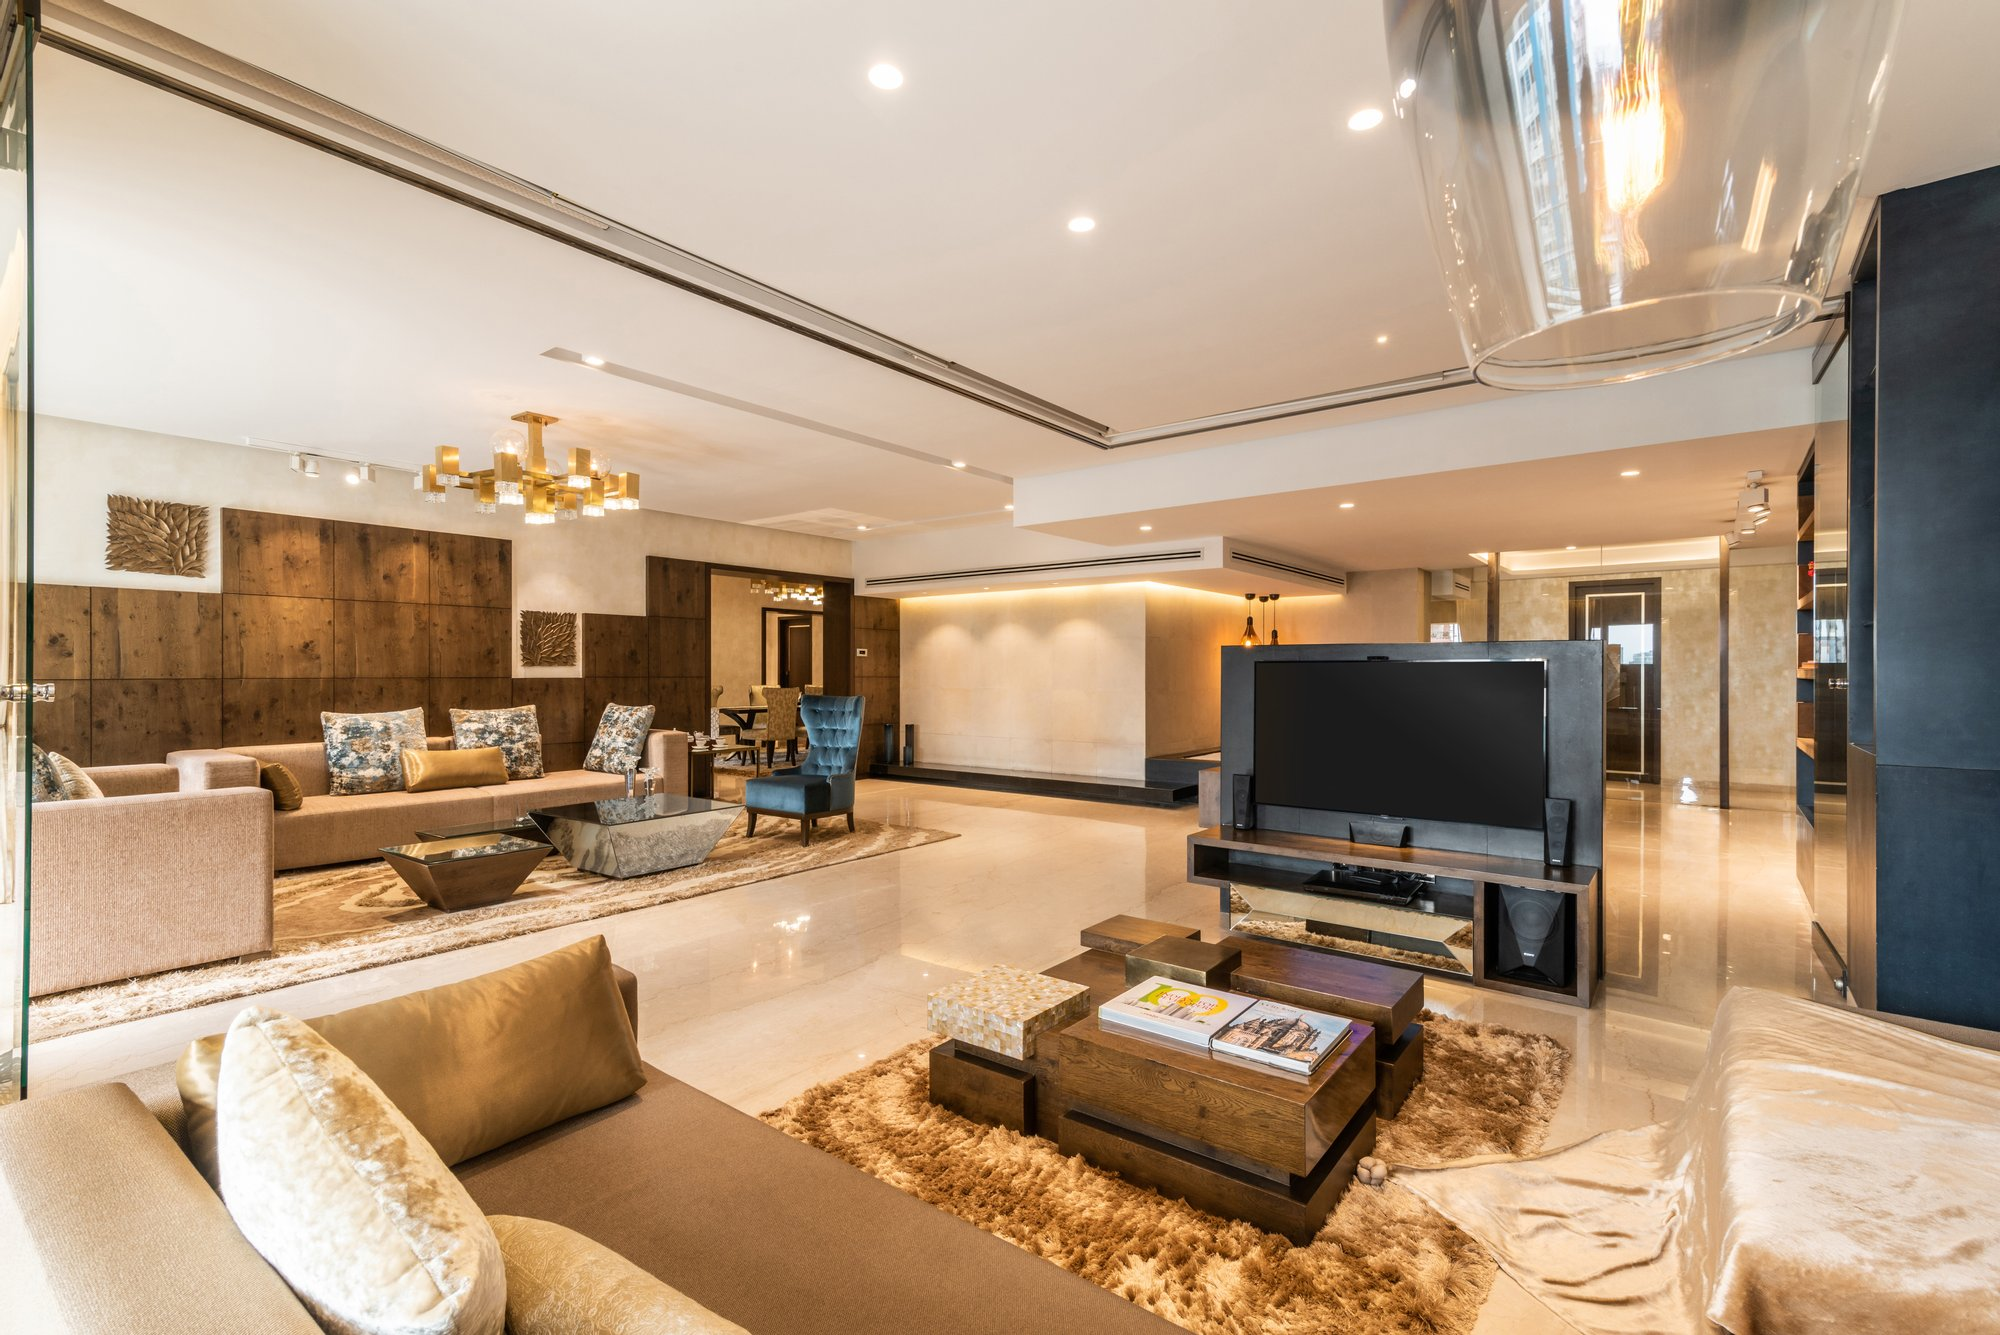 Apartment in Bandra Kurla Complex, Maharashtra, India 1